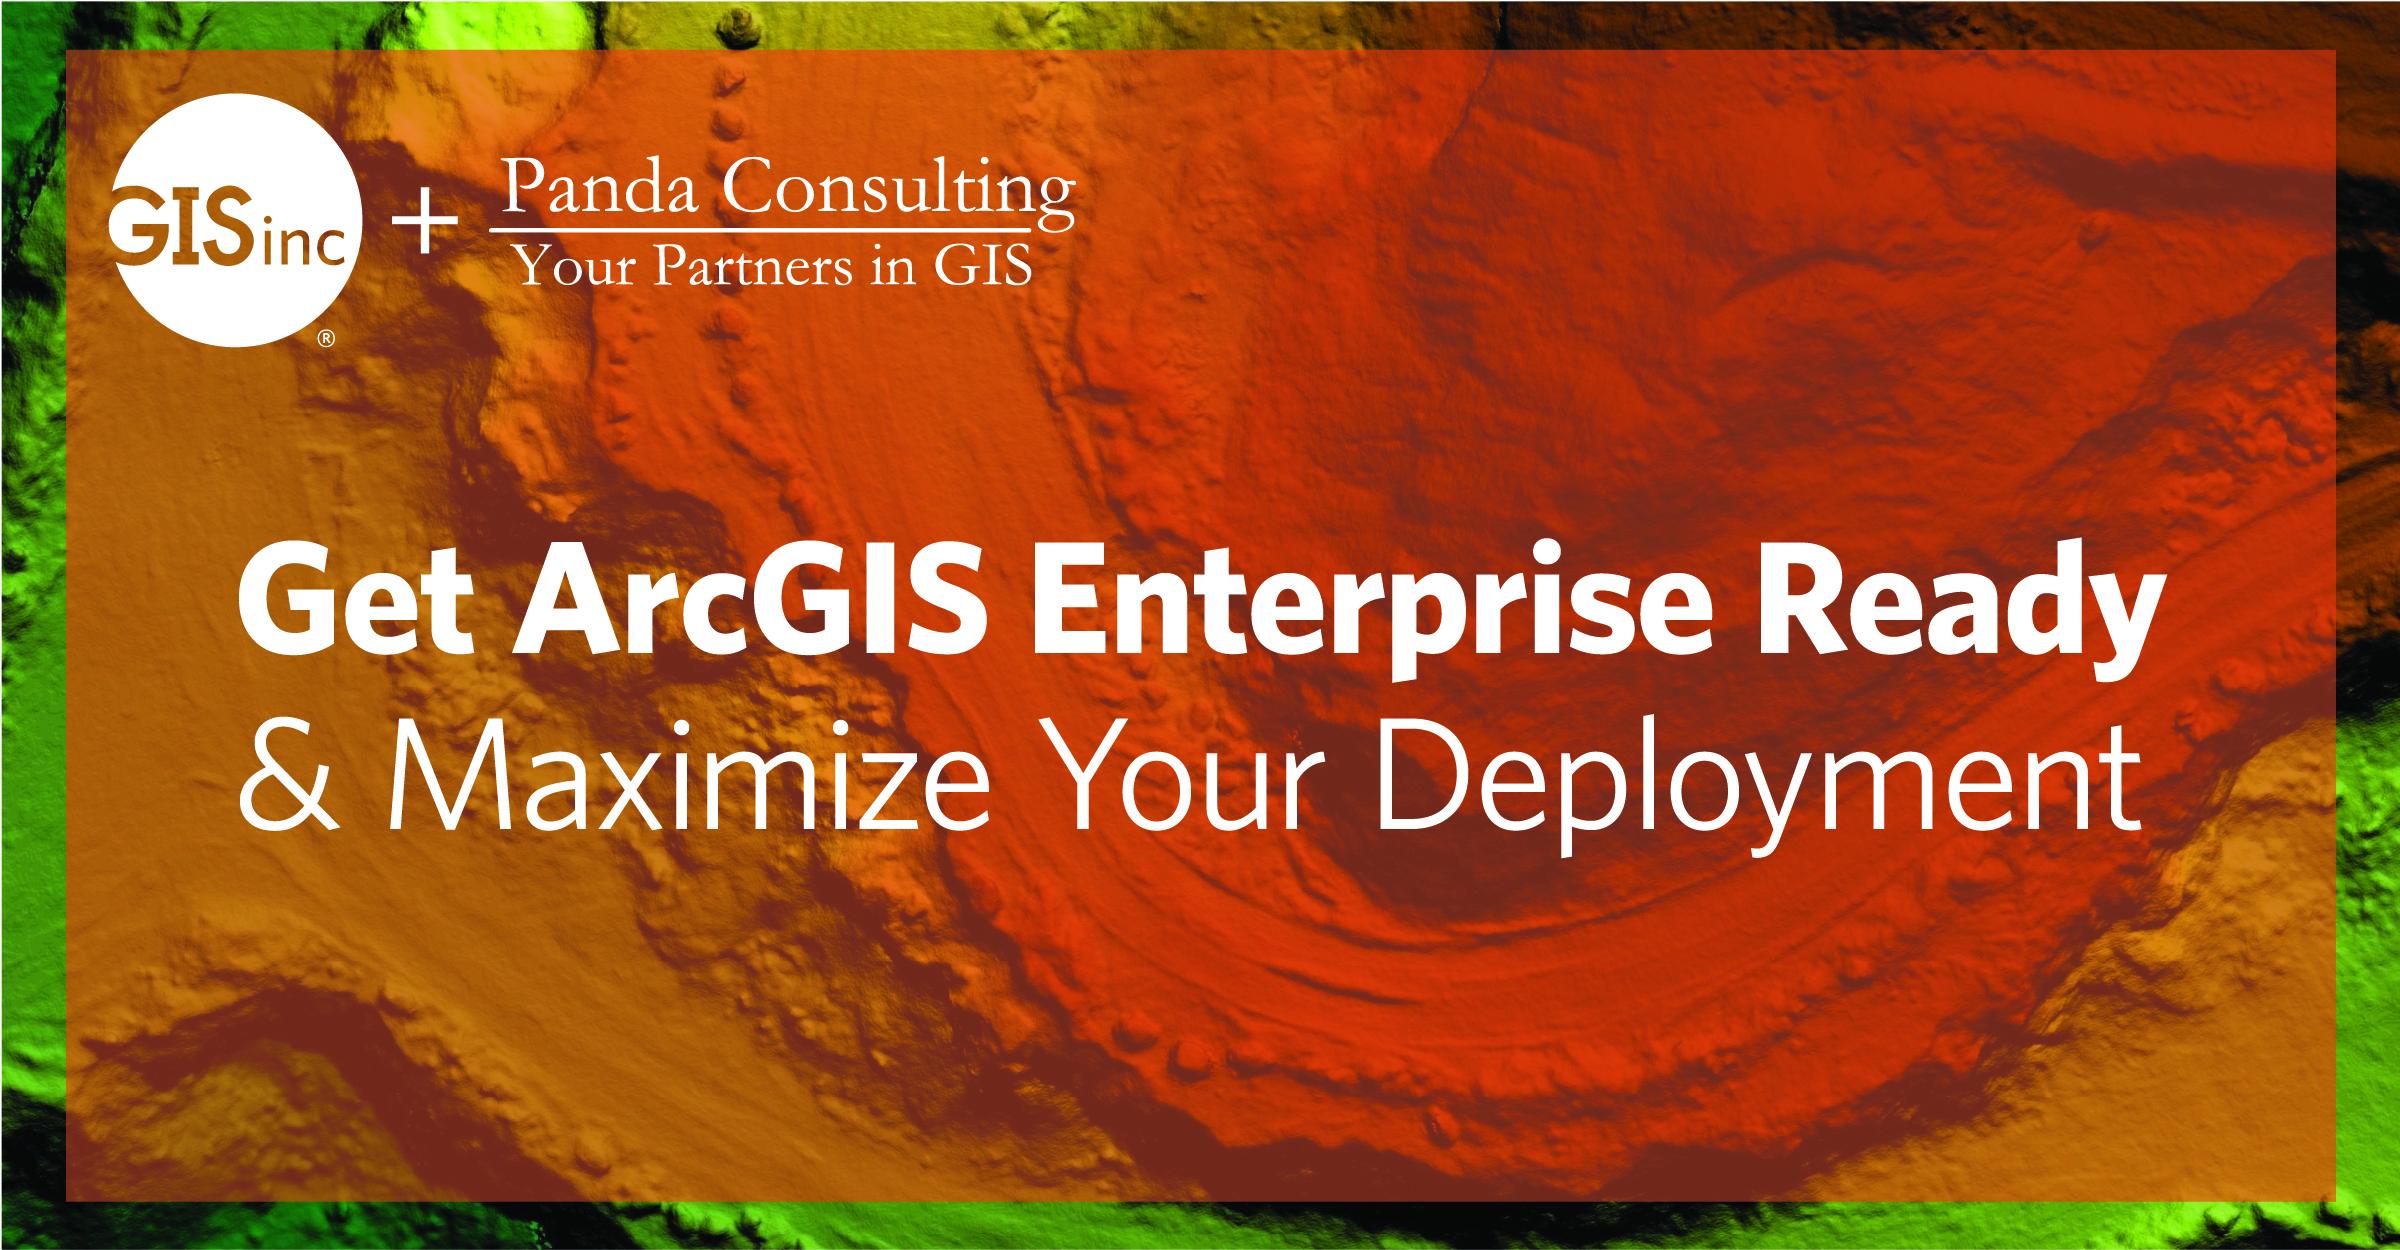 Webinar Q&A: Get ArcGIS Enterprise Ready